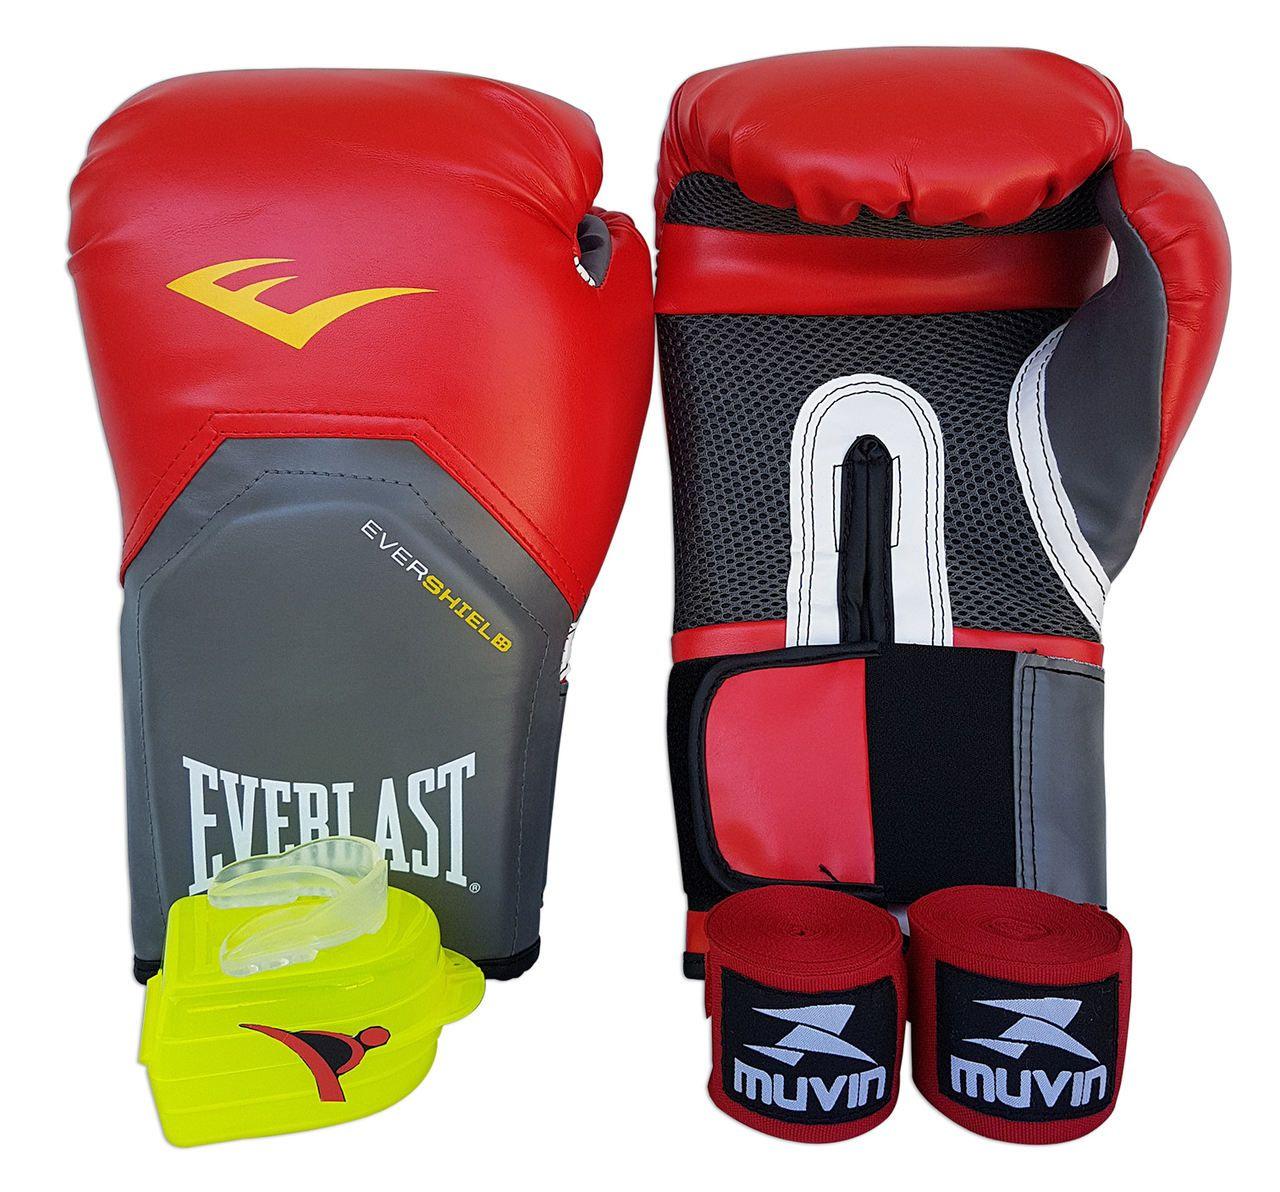 Kit de Boxe / Muay Thai 12oz - Vermelho - Pro Style - Everlast  - PRALUTA SHOP